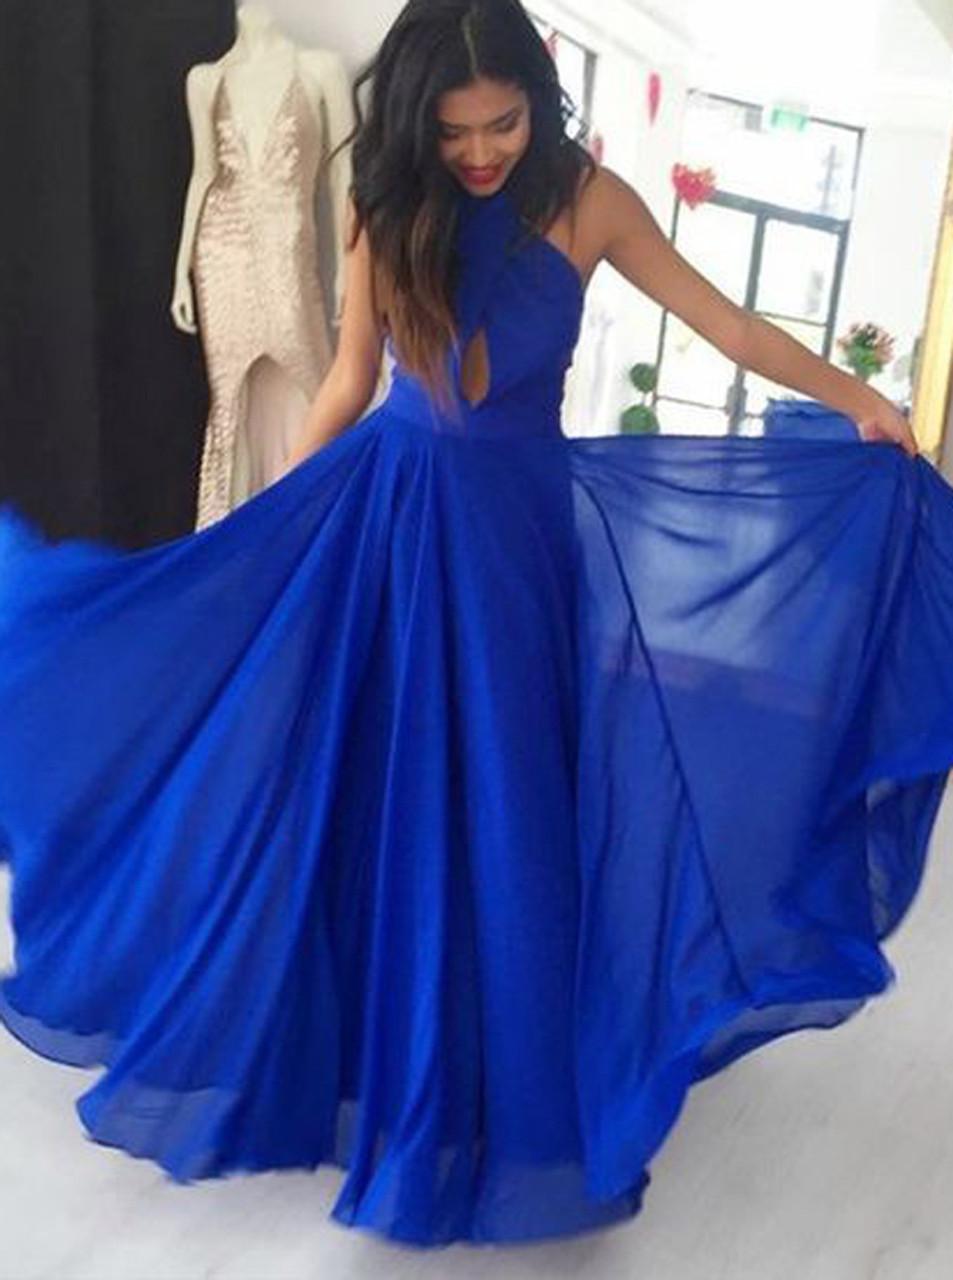 67d5c6db08f3b ... Royal Blue Chiffon Prom Dresses,Halter Prom Dress,11911. Previous Next